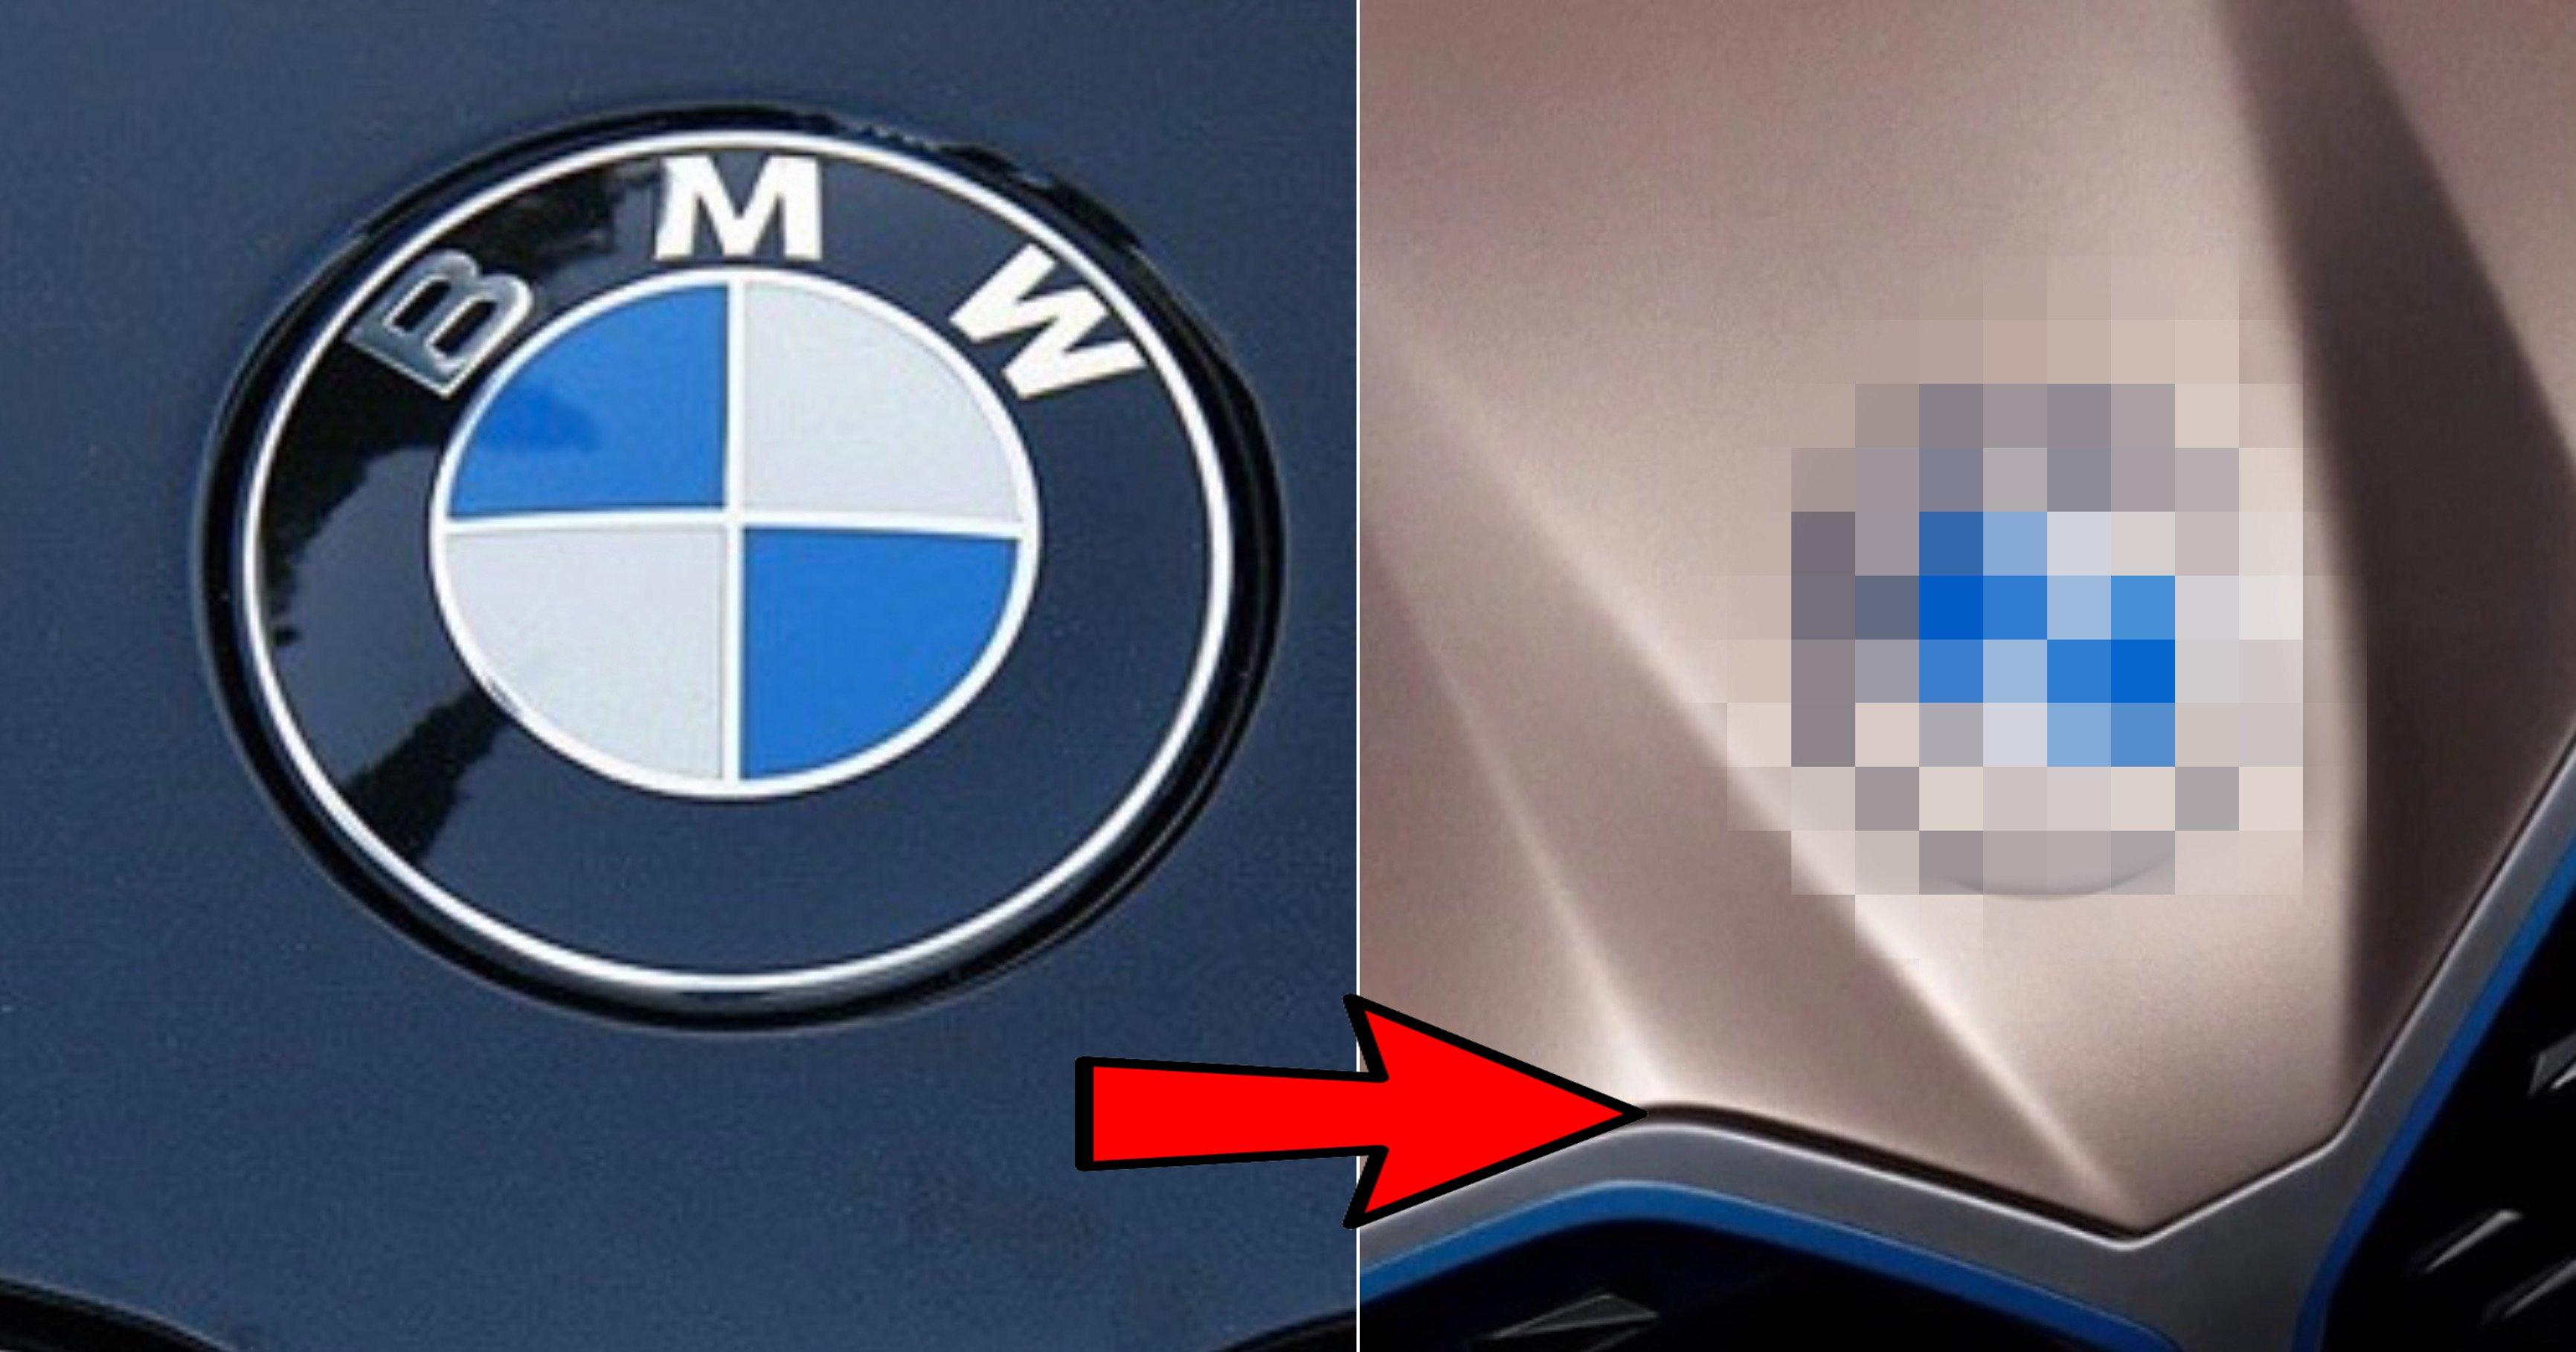 "41e691e8 e647 432e 9cfe 1bdbd7f25756.jpeg?resize=1200,630 - ""별론데...?""...'별로다 vs 훨씬 낫다'로 의견 나뉘고 있는 23년 만에 바뀐 BMW 로고.jpg"